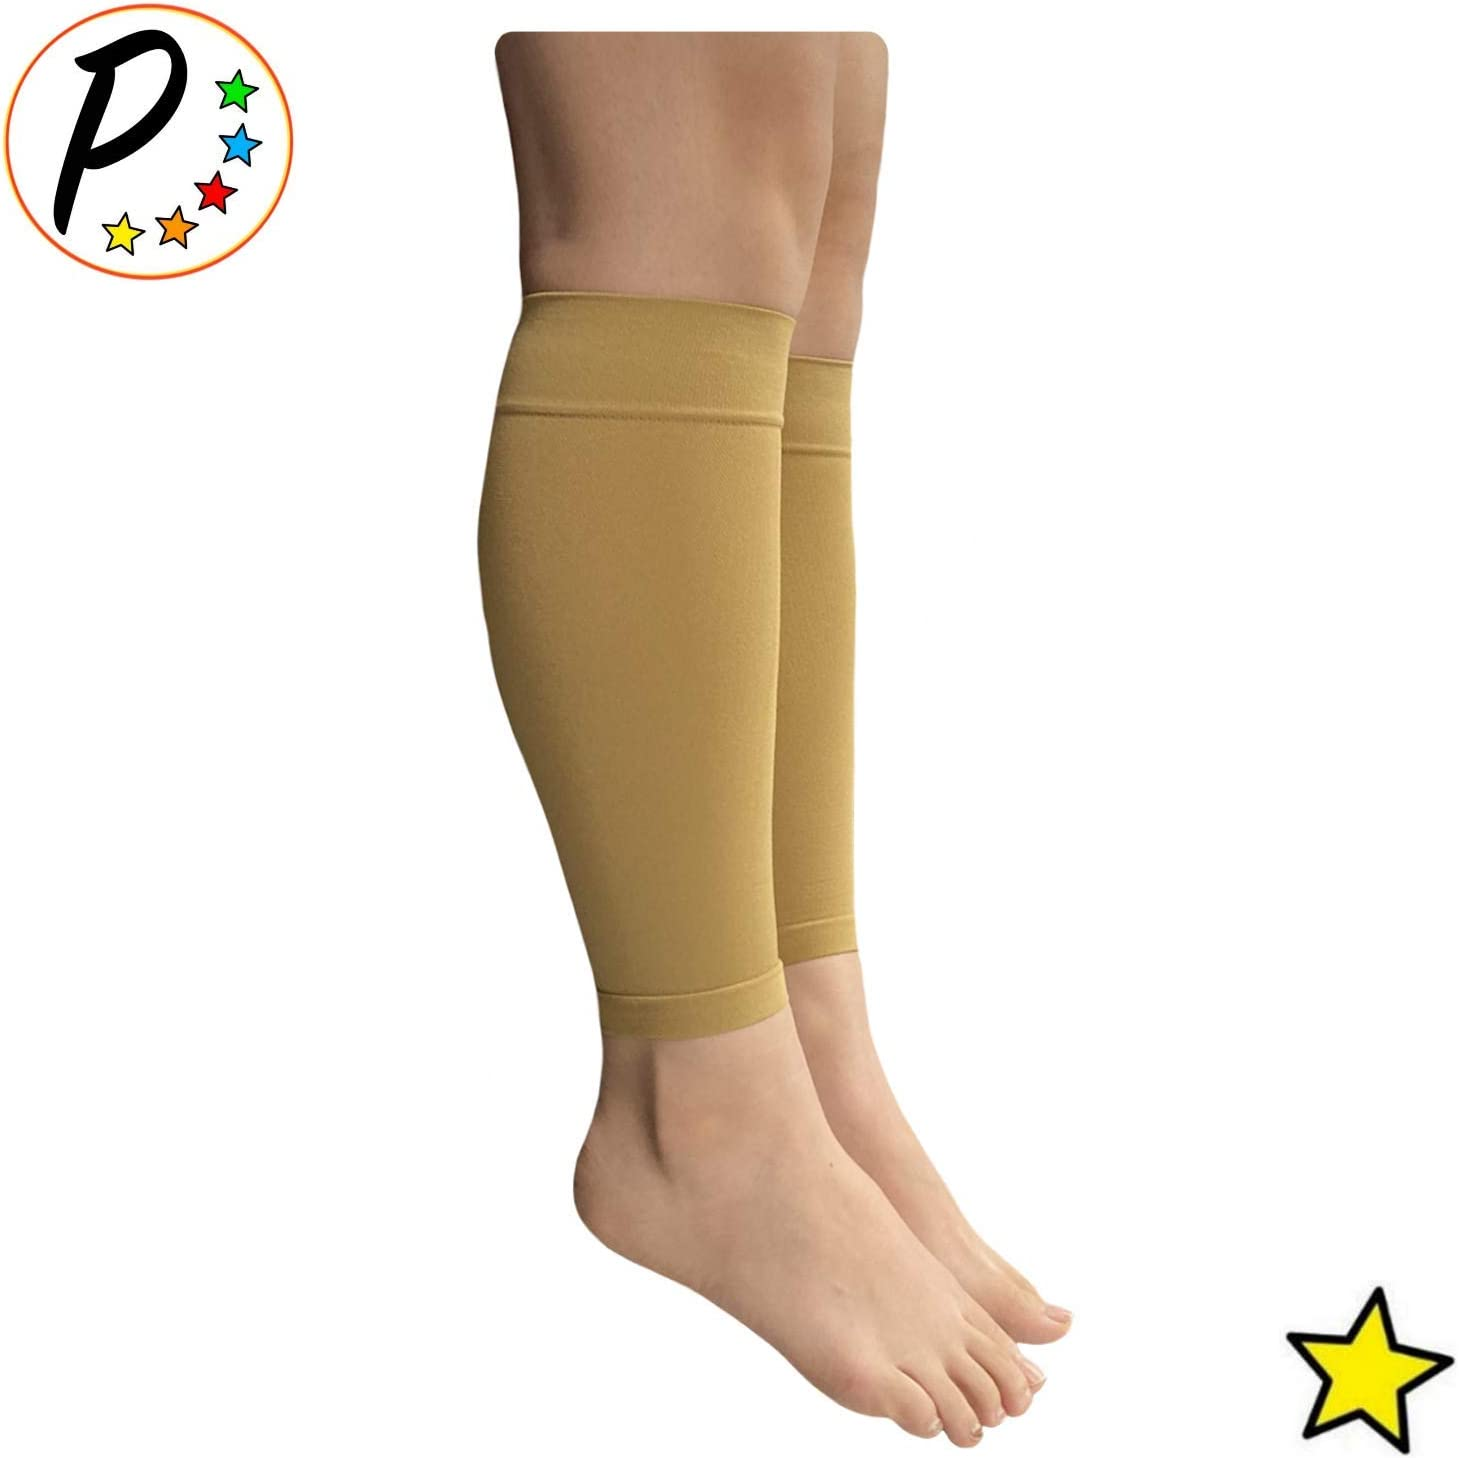 Presadee Shin 8-15 mmHg Mild Compression Leg Fatigue Circulation Calf Sleeve Nude, 3XL